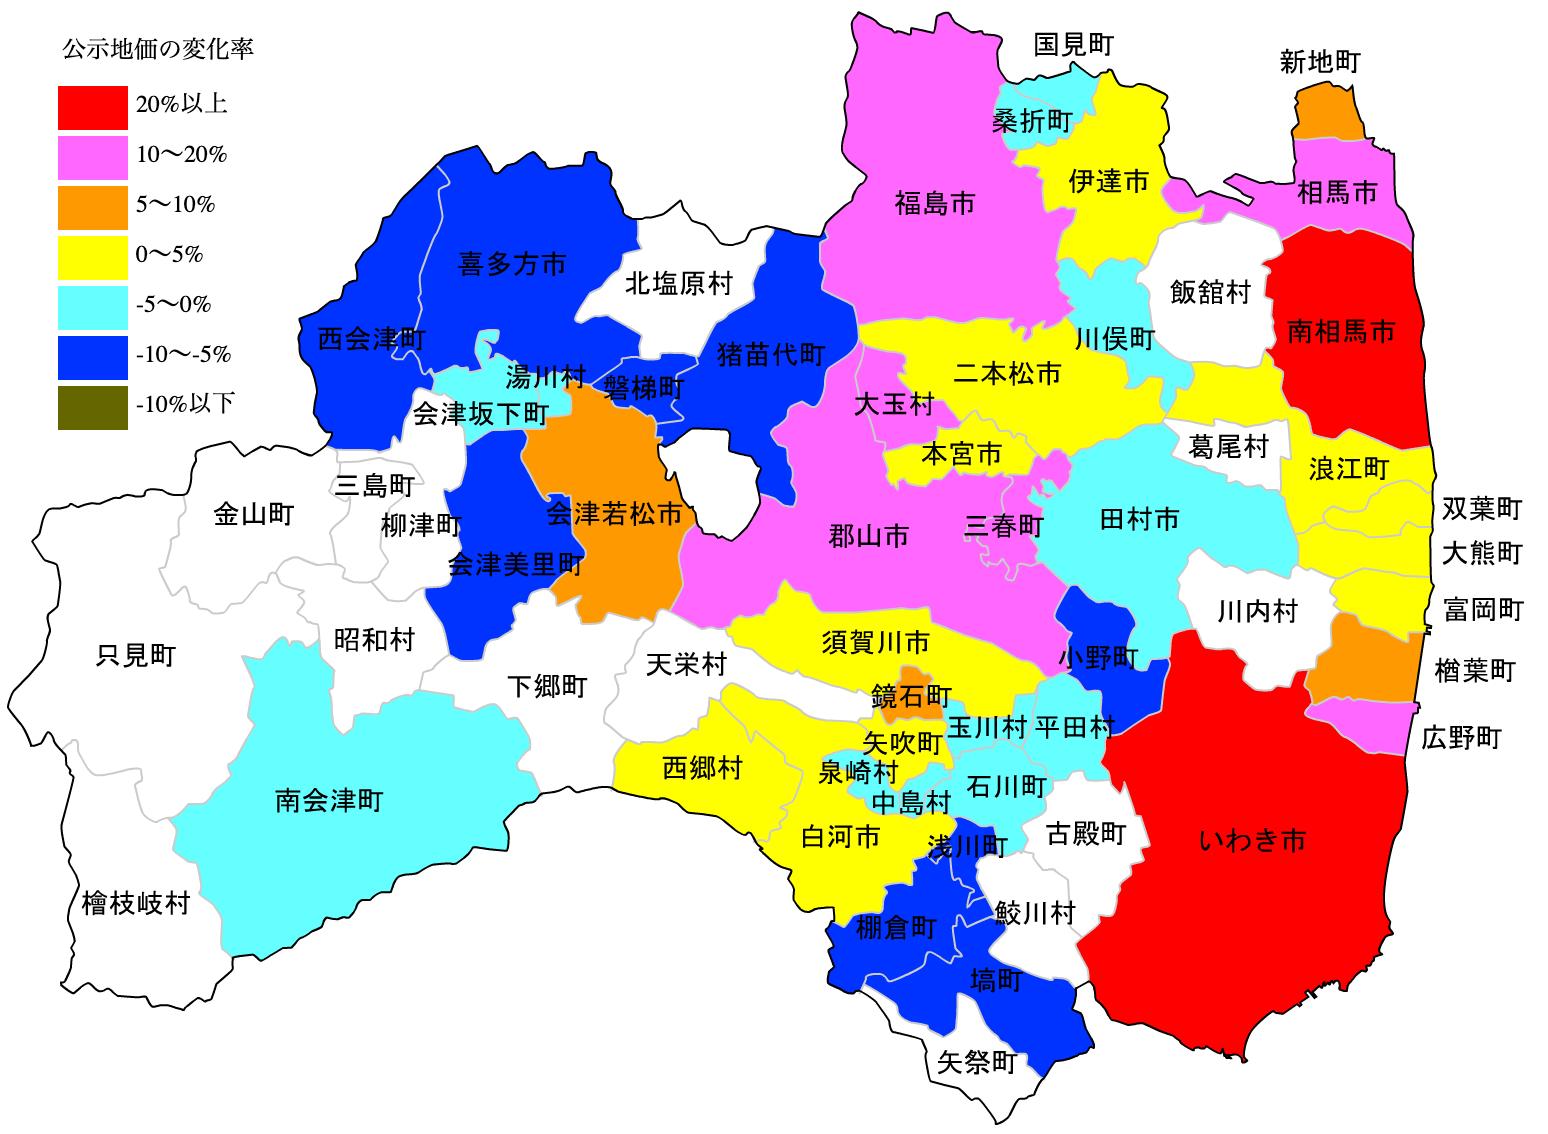 福島県の公示地価の変化率図 H25-H31